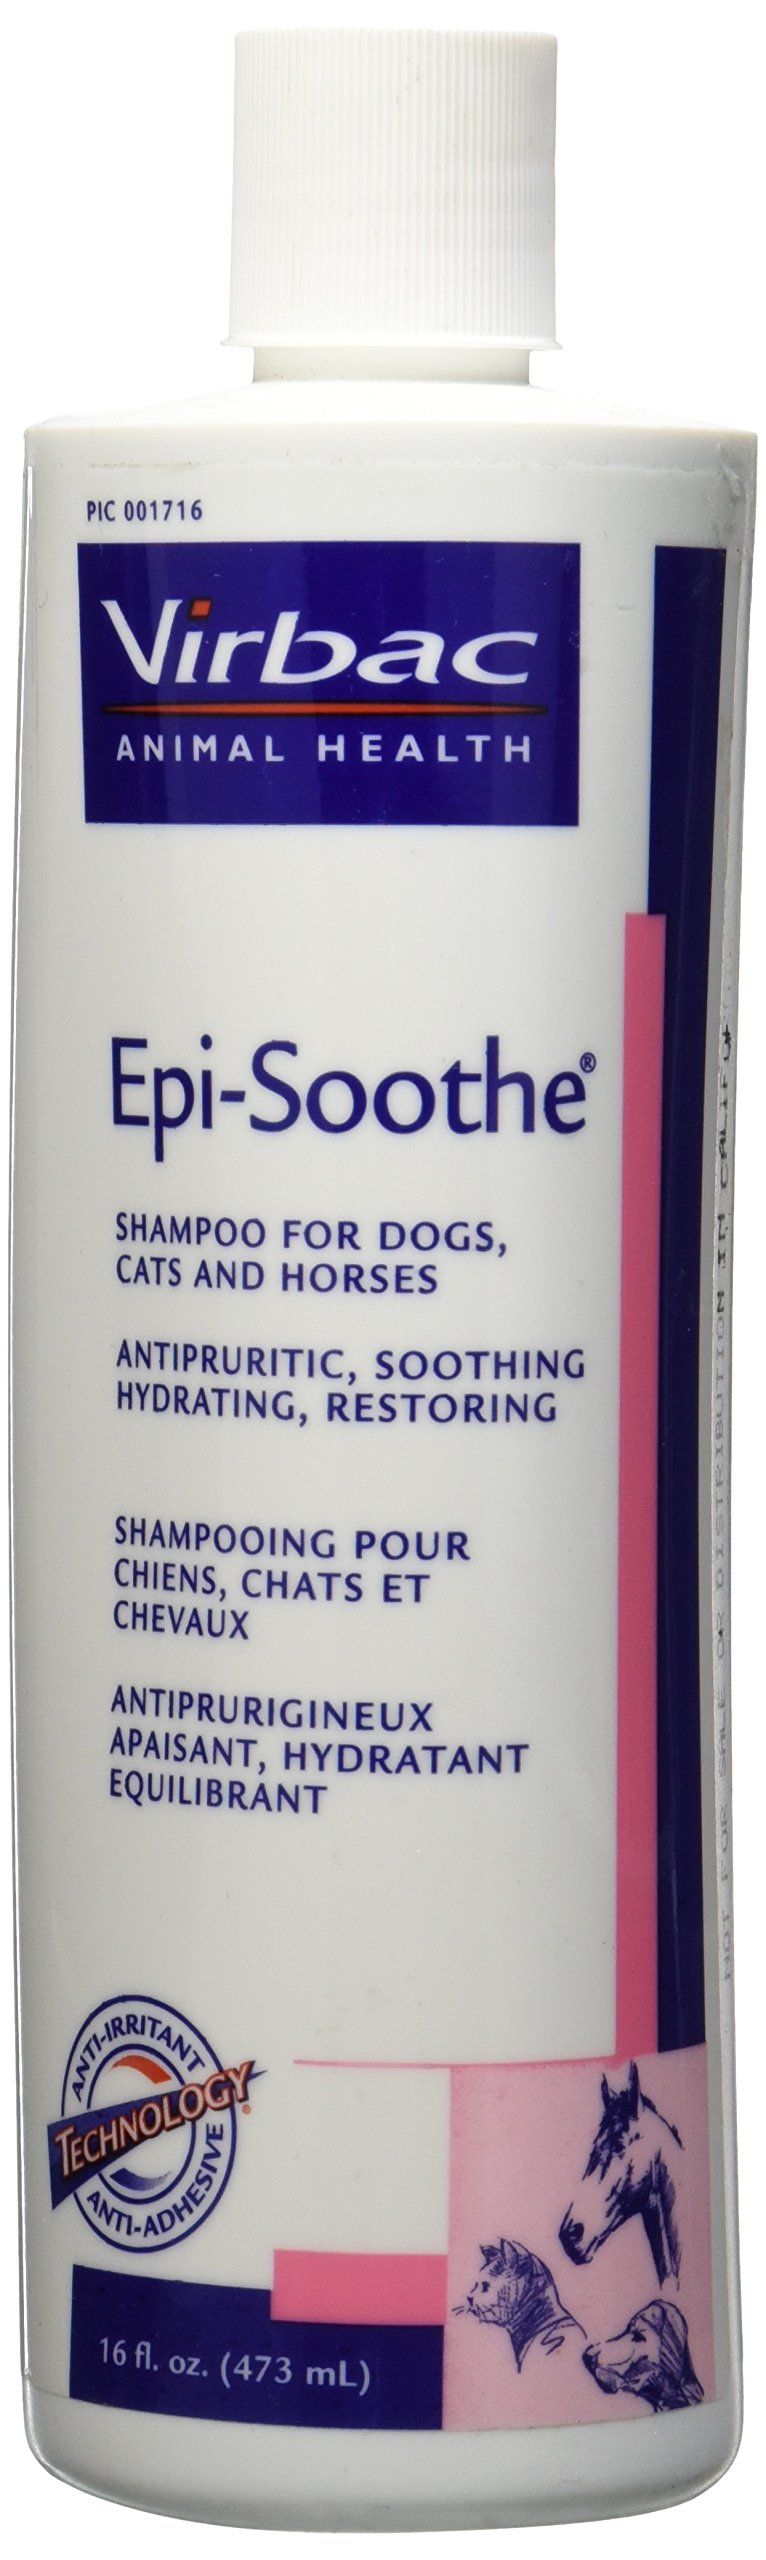 Epi-Soothe Shampoo, 16 oz